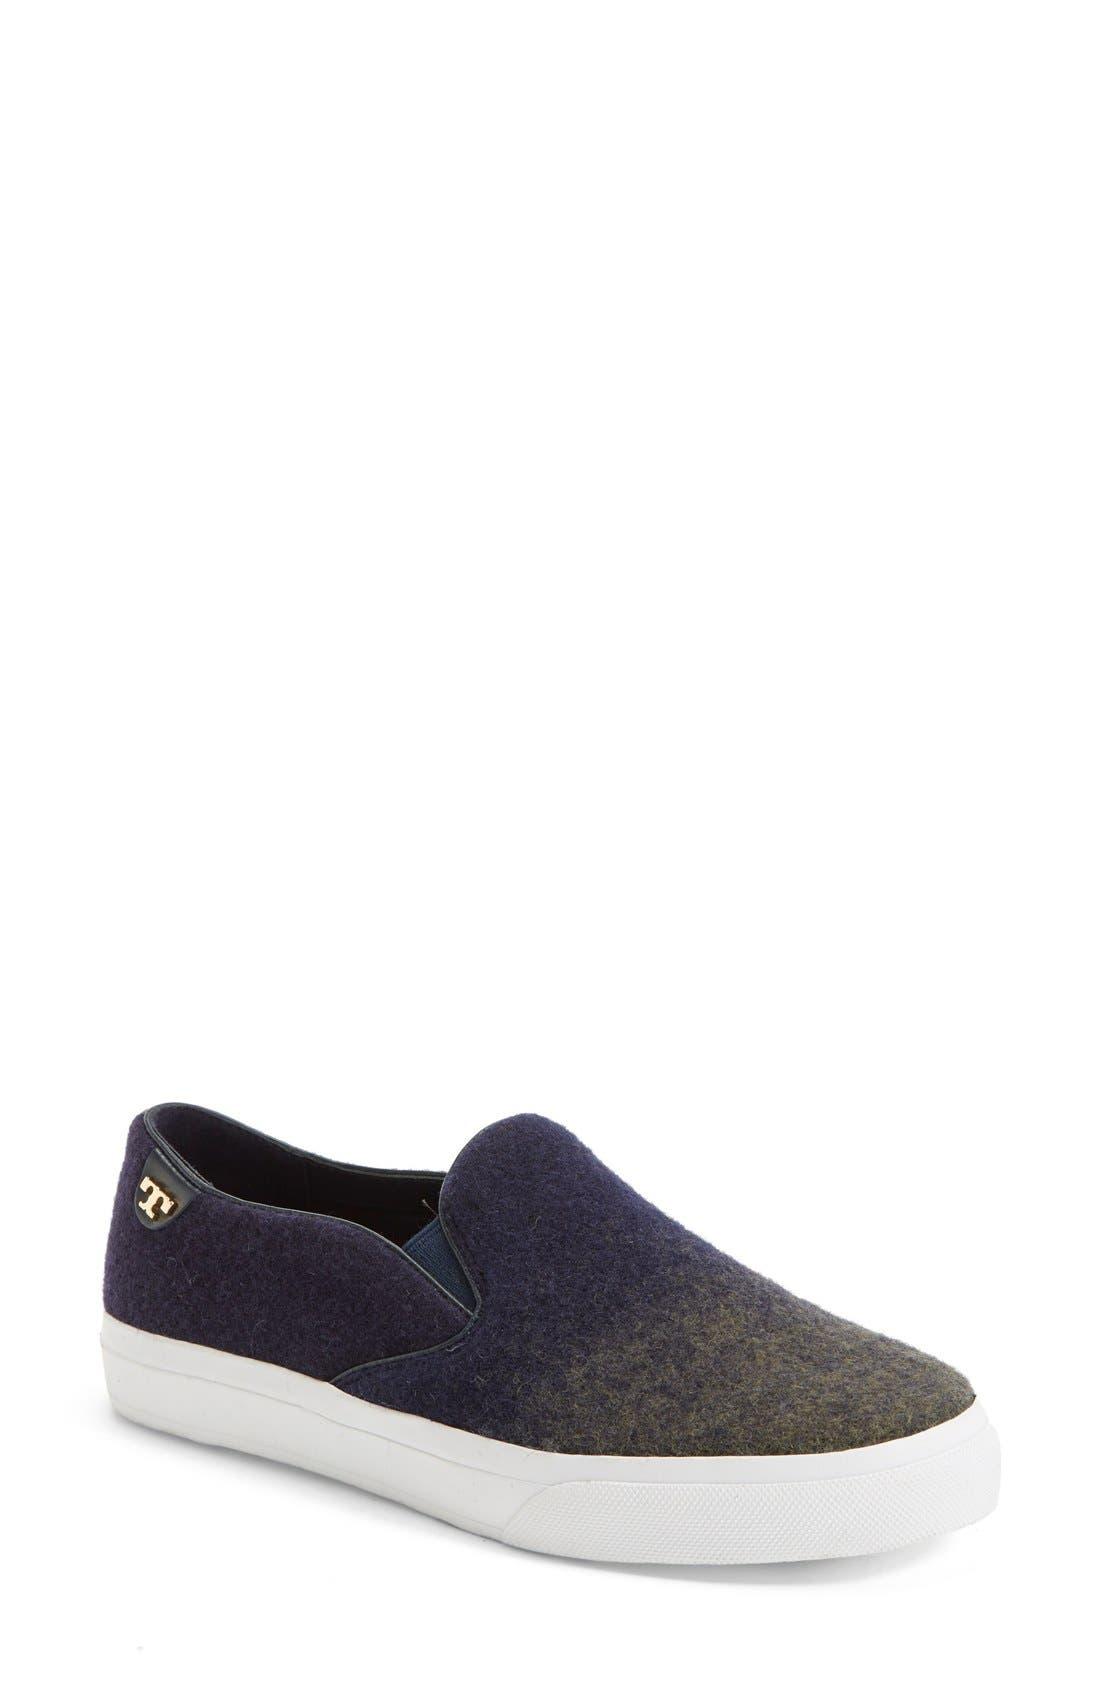 Alternate Image 1 Selected - Tory Burch 'Stardust' Slip-On Sneaker (Women)